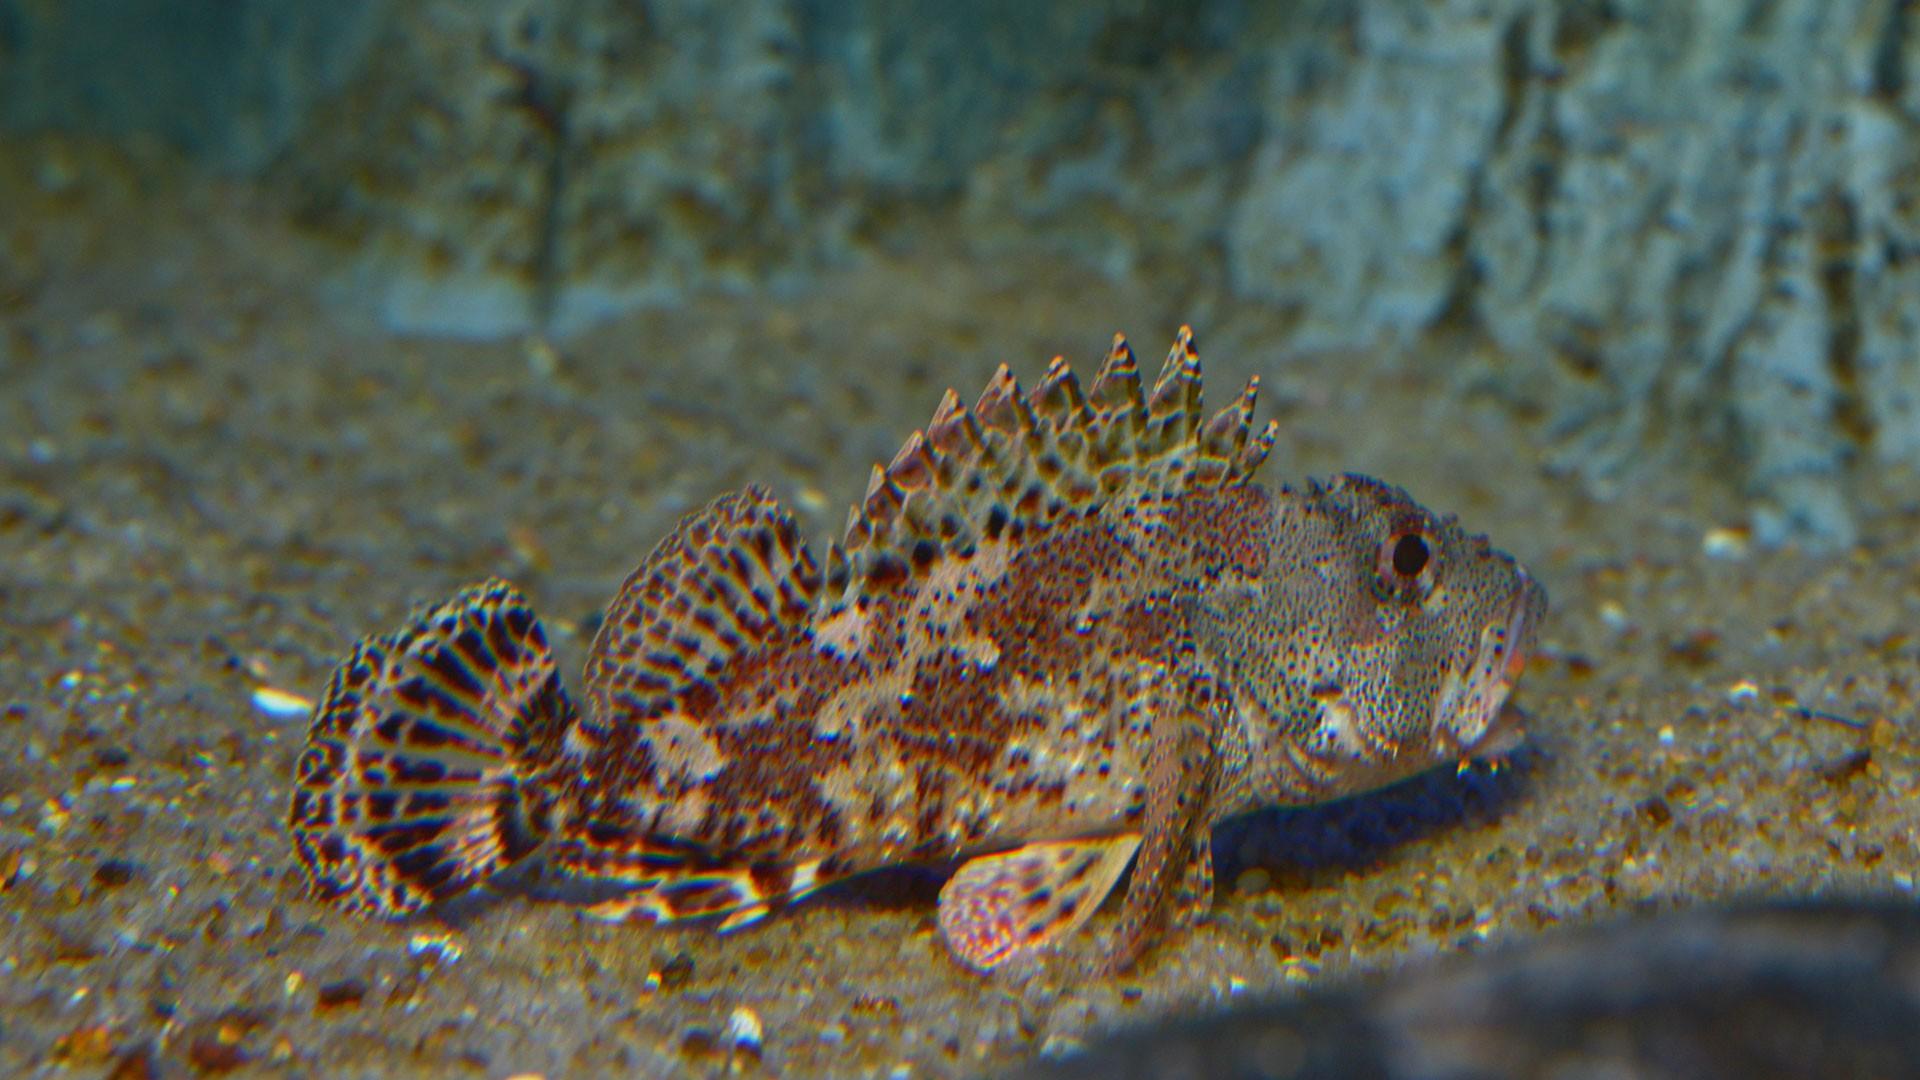 Black scorpionfish